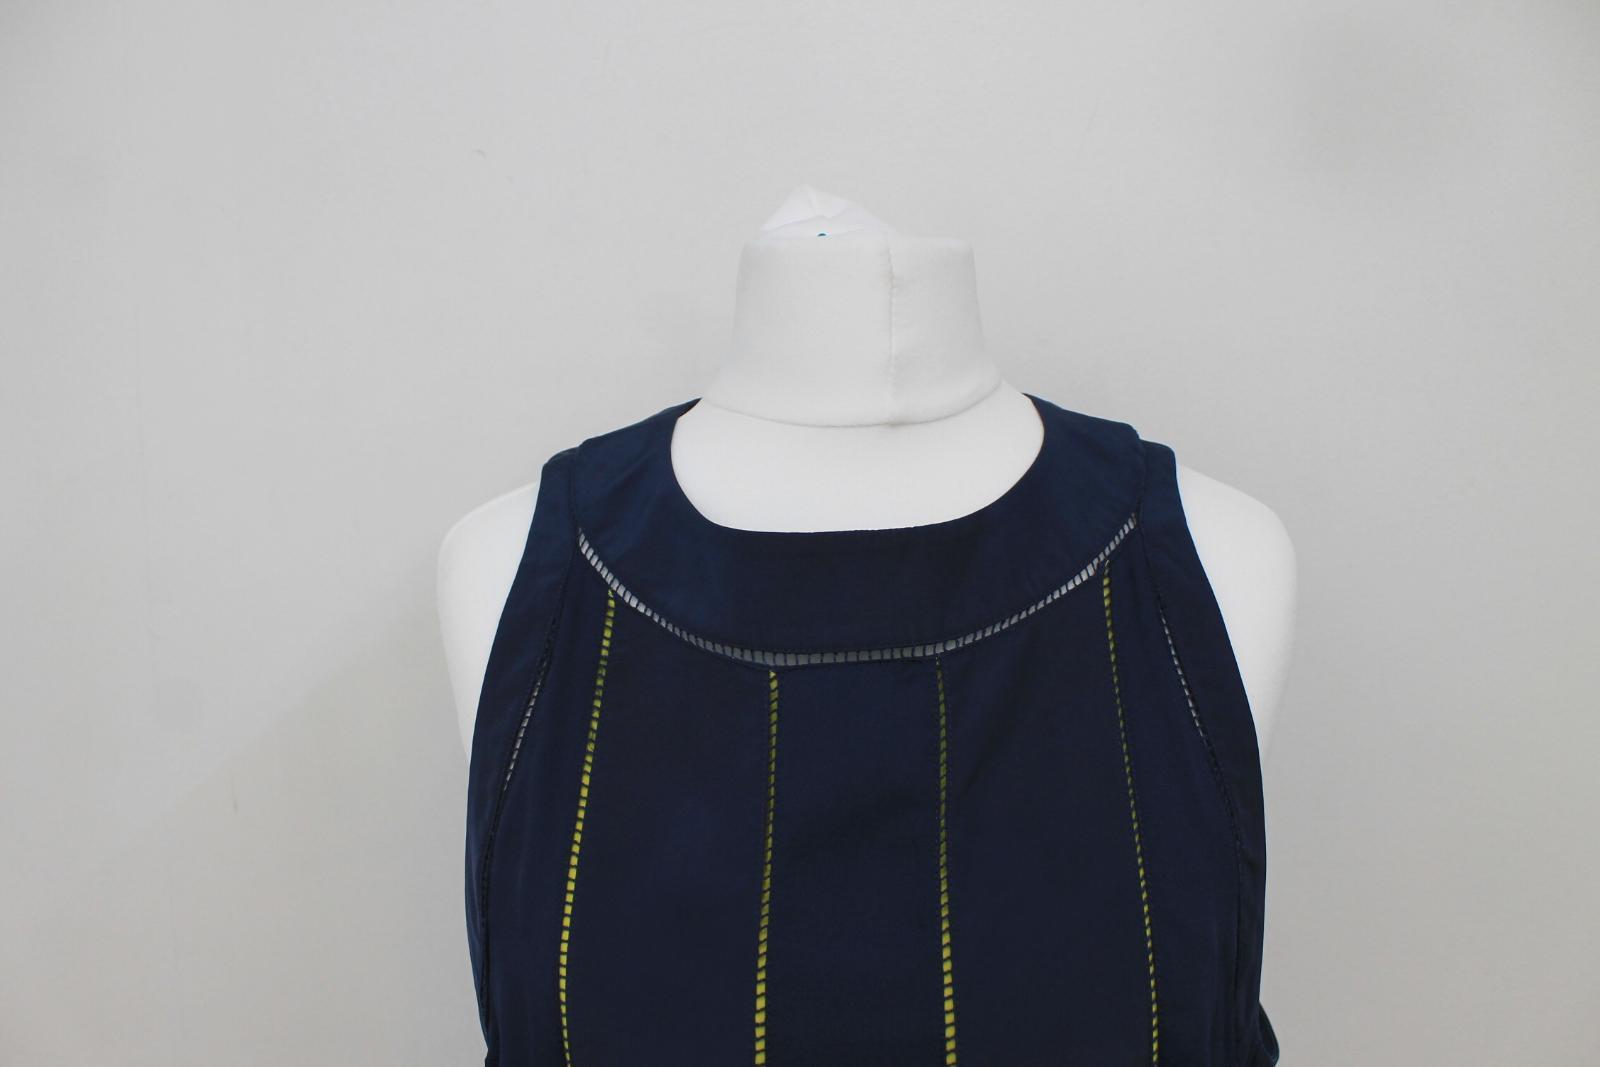 KENZO-PARIS-Ladies-Navy-Blue-Neon-Yellow-Sleeveless-Shift-Dress-FR42-UK14 thumbnail 6